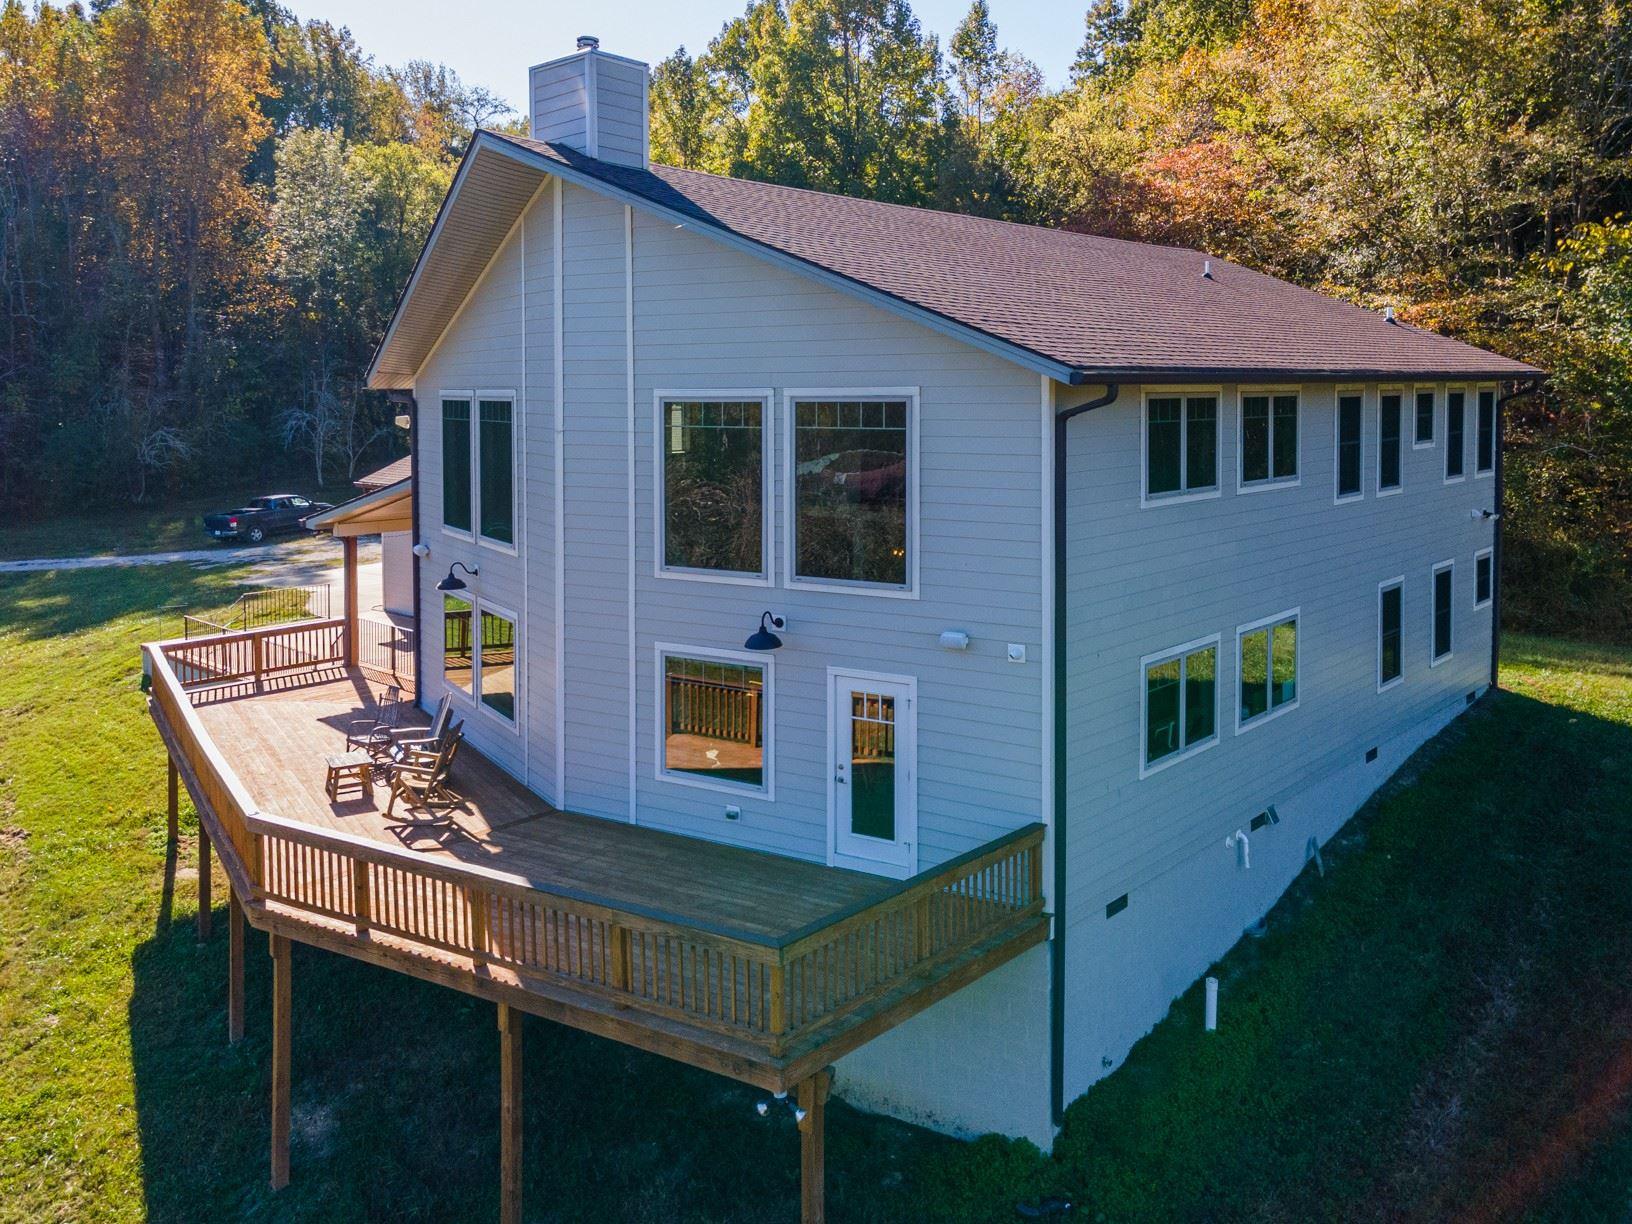 2794 Brown Hollow Rd, Columbia, TN 38401 - MLS#: 2200273